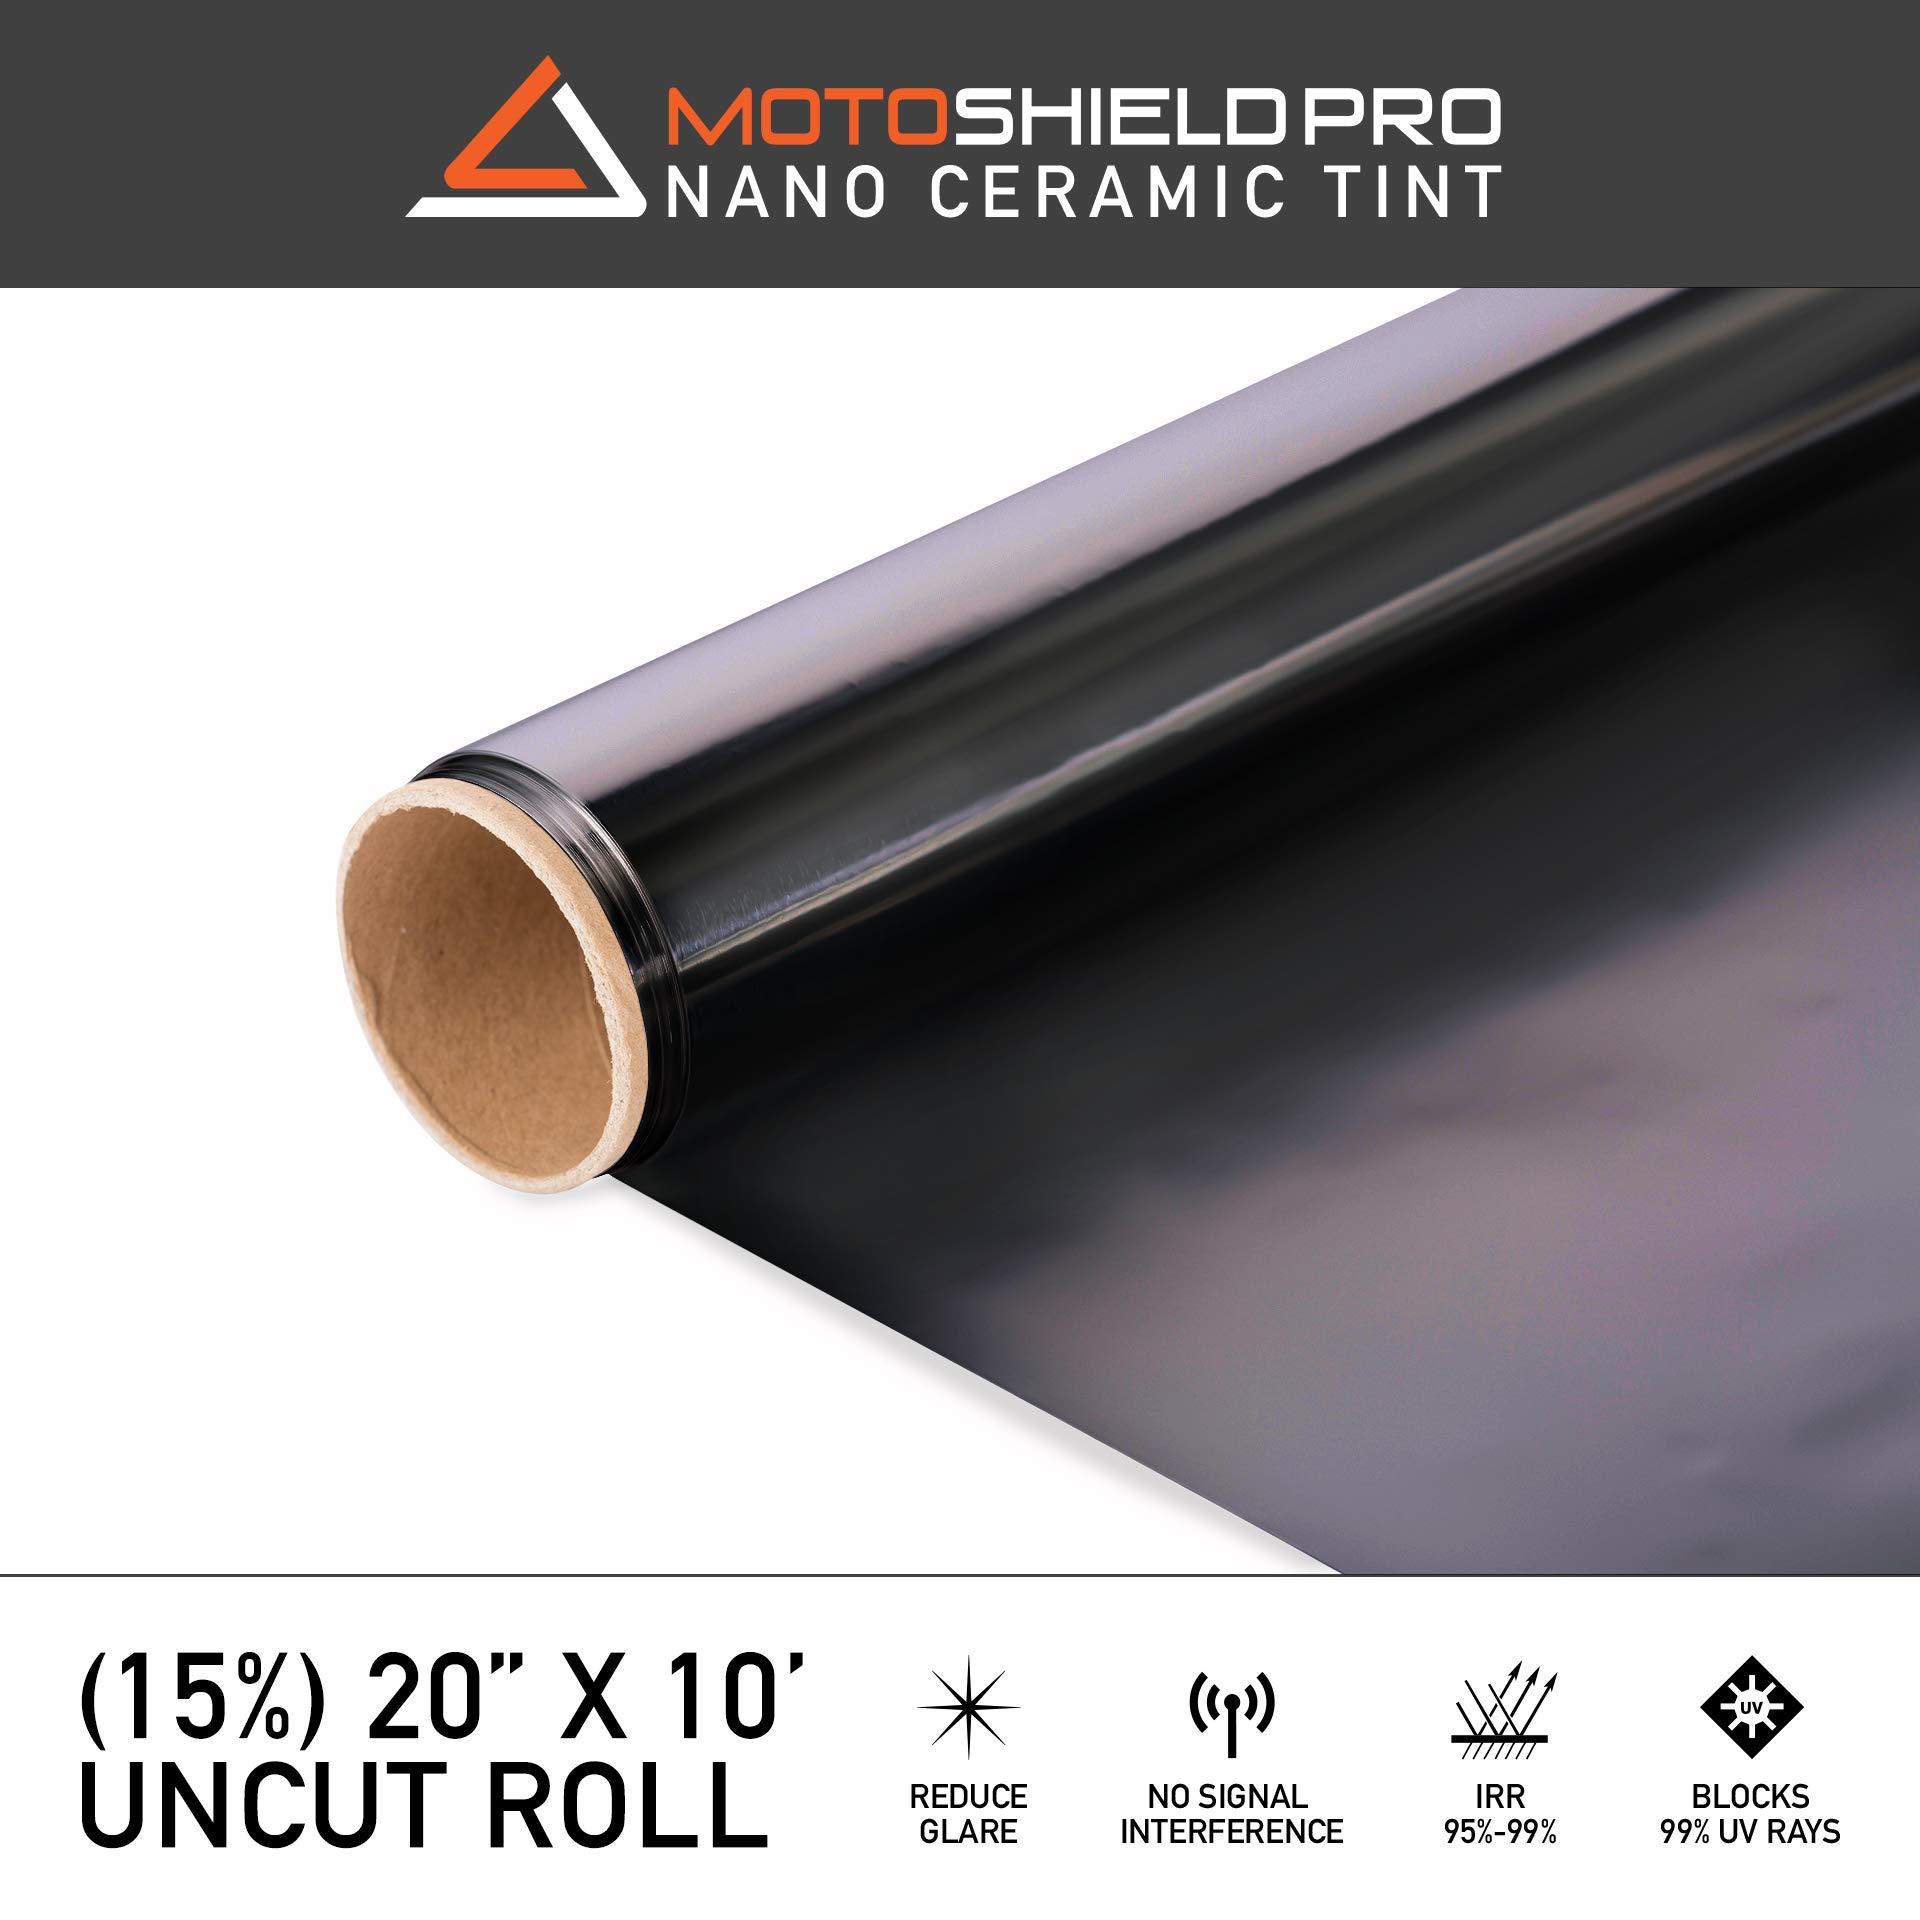 MotoShield Pro Ceramic Tint Film [Blocks Up to 99% of UV/IRR Rays] 20 Inches x 10 Feet - Window Tint Film Roll (15%)